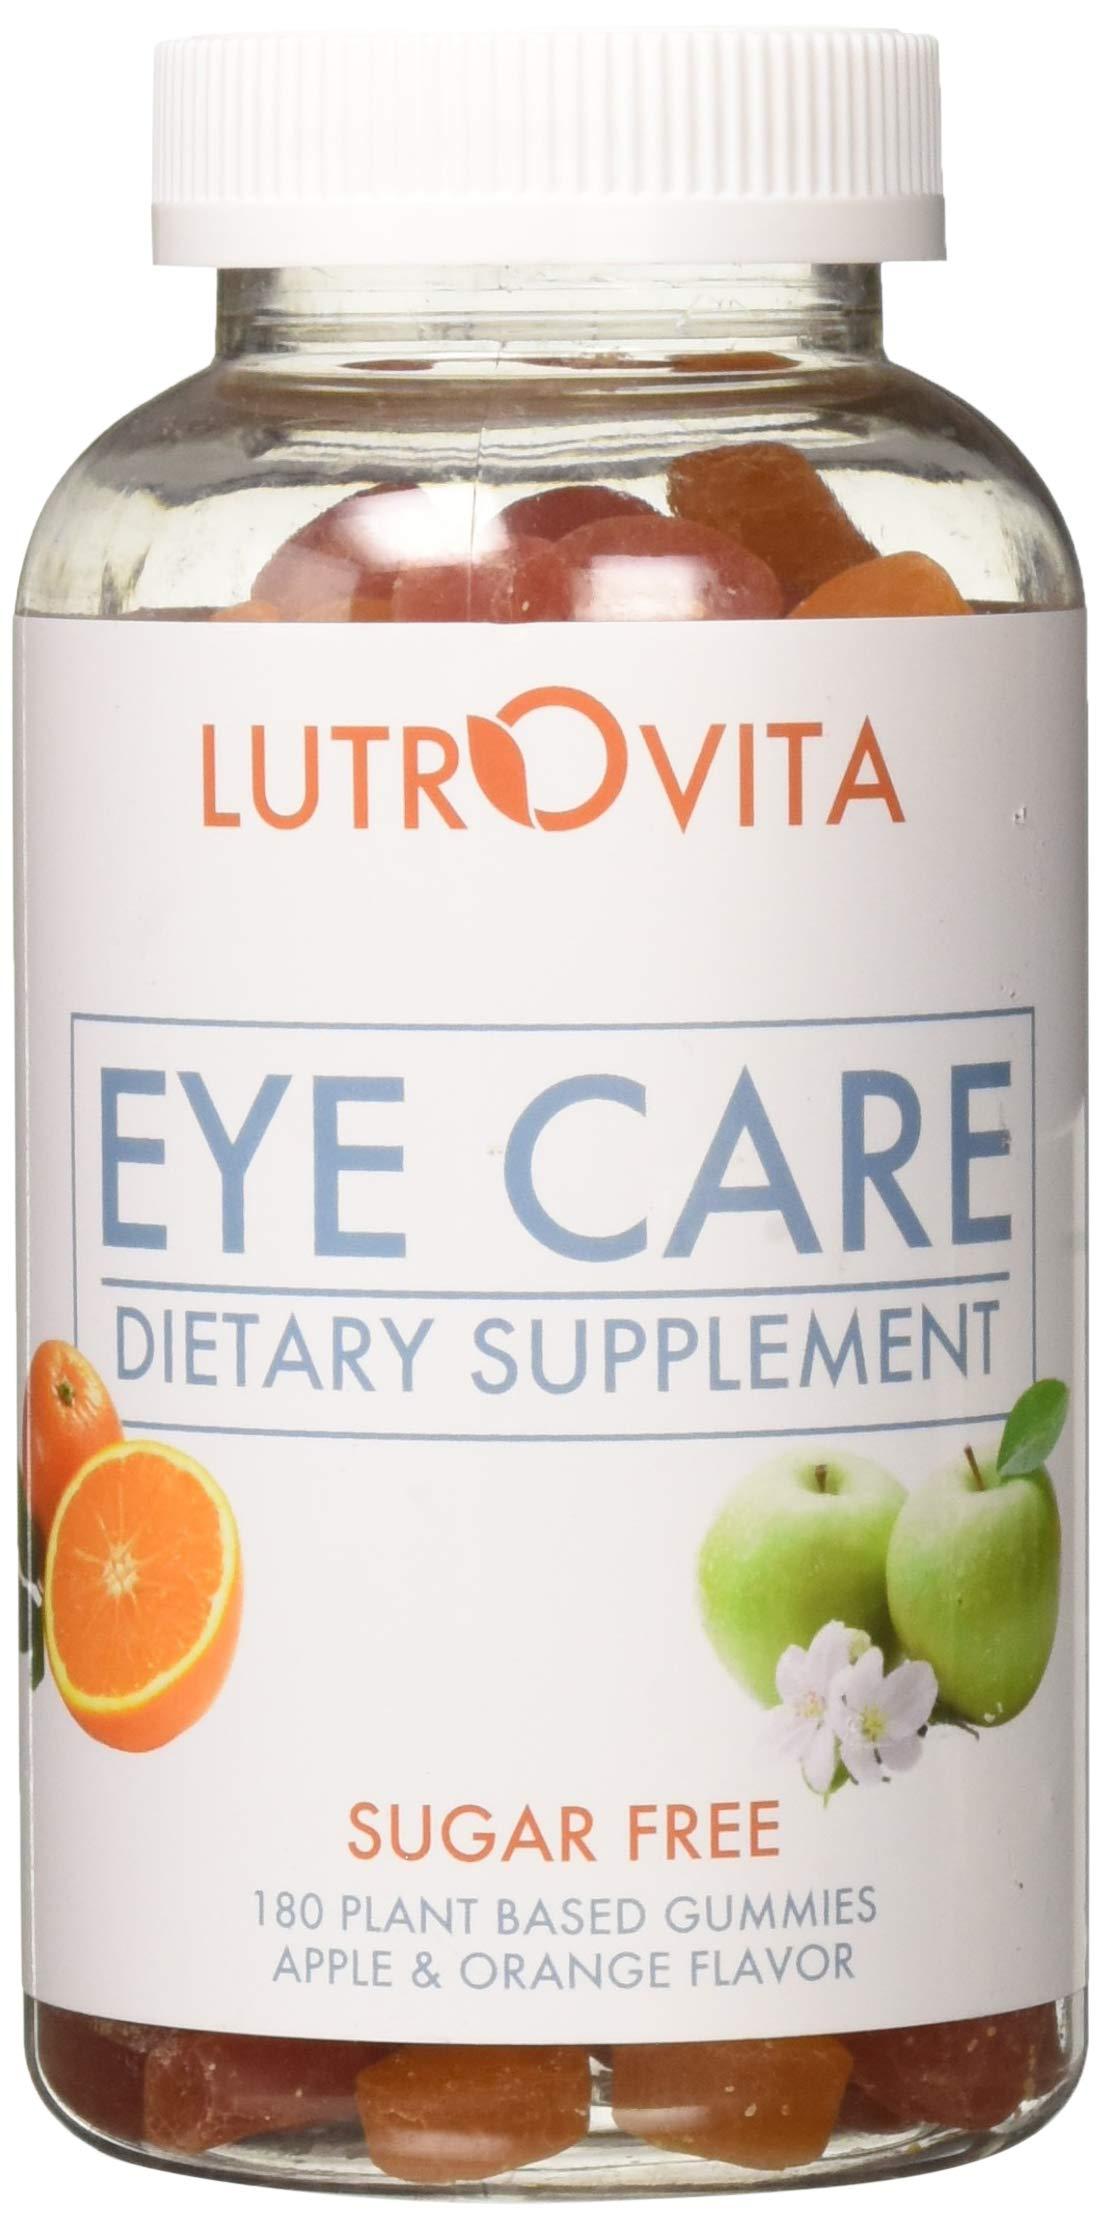 Lutrovita Sugar Free Eye Care Gummy, Orange & Apple, 180 Count